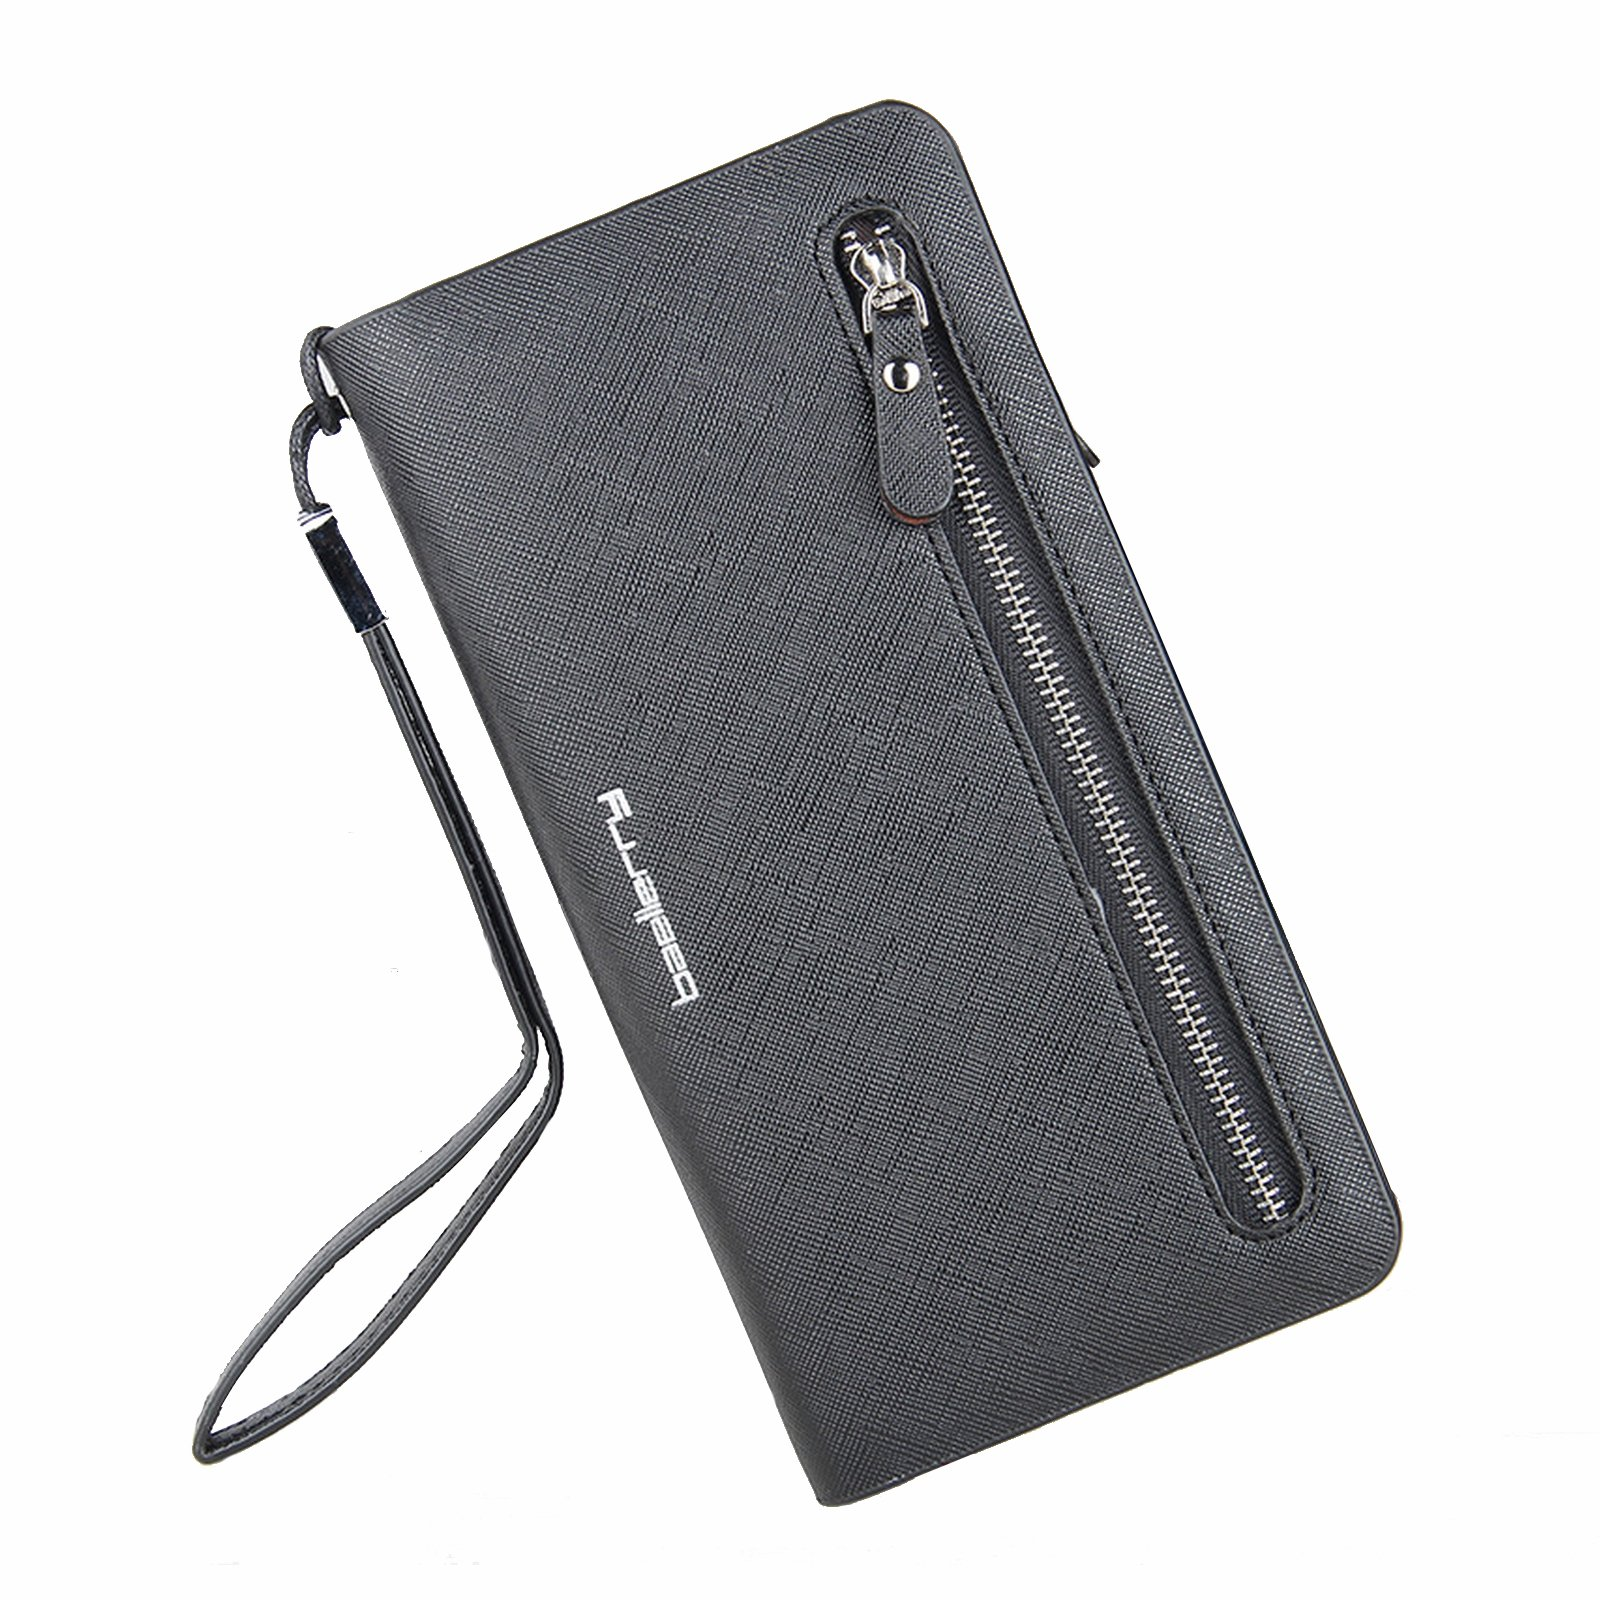 Leather Wallet RFID Blocking Zipper Purse Checkbook Card Holder Organizer Black